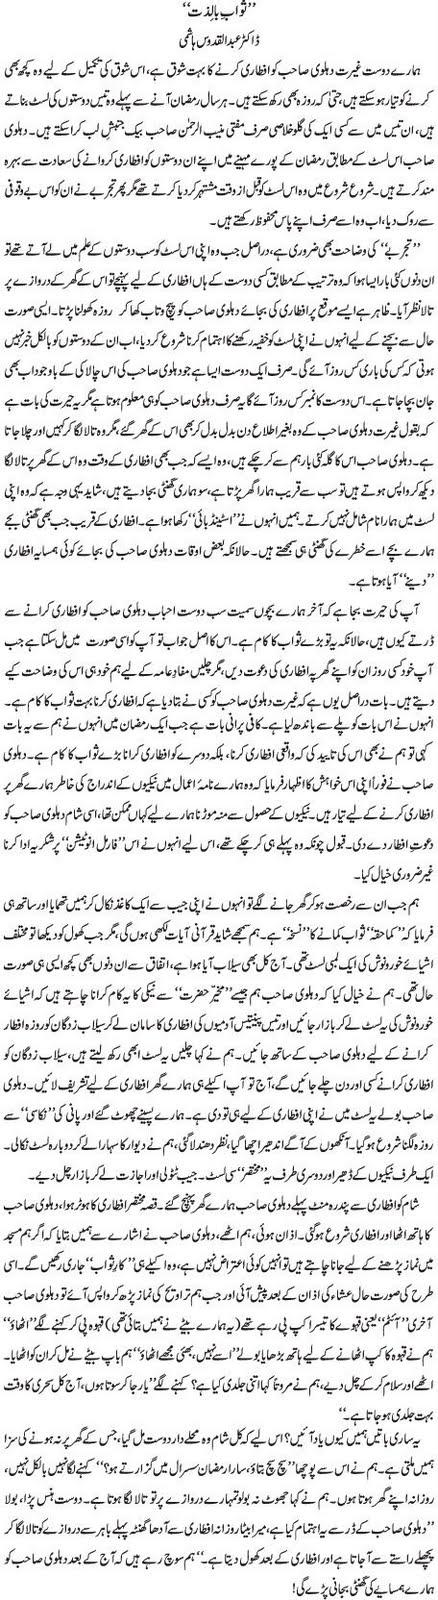 funny scholarships. Scholarships. Funny urdu